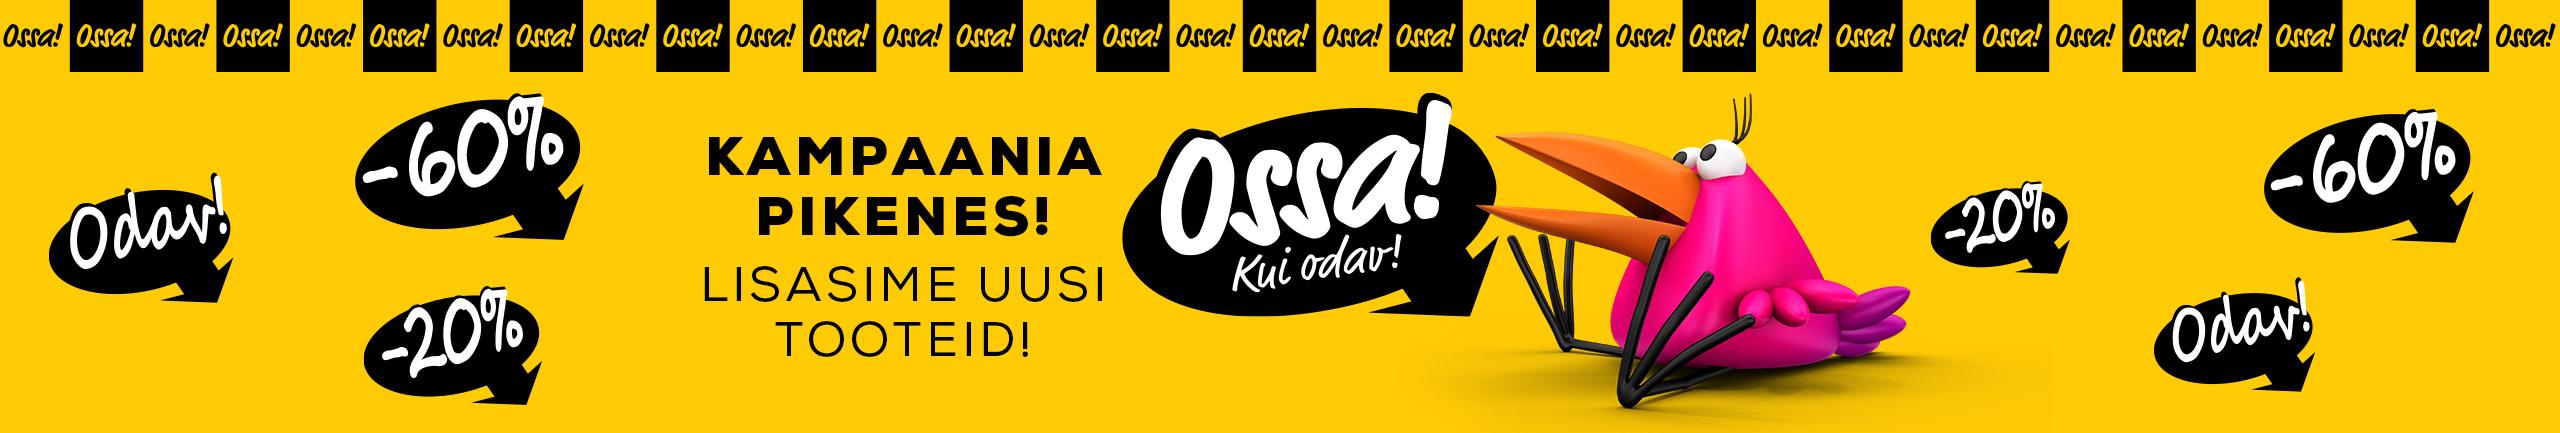 FronPageLarge Ossa pikenes!